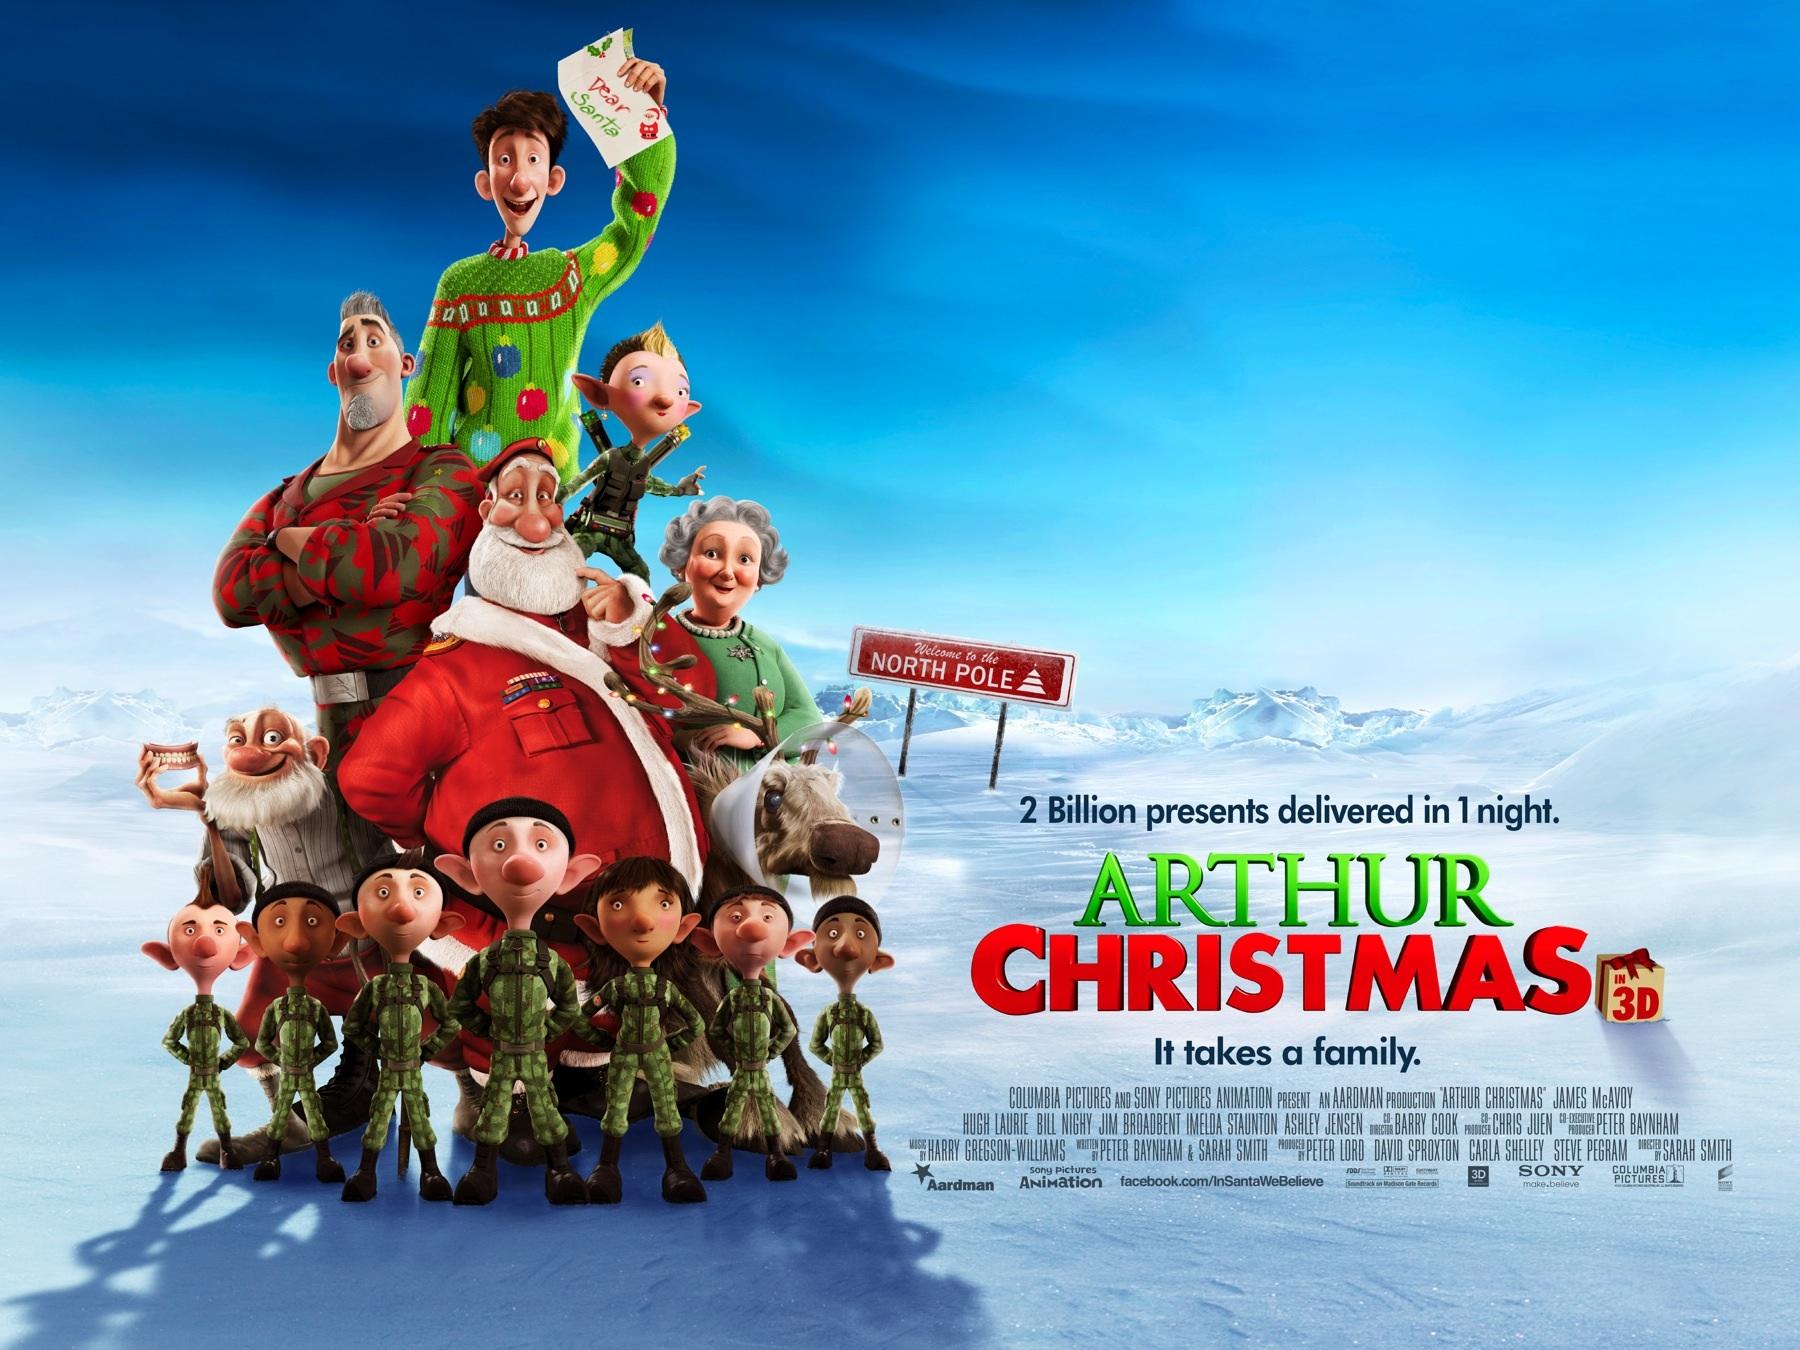 Arthur Christmas wallpapers Movie HQ Arthur Christmas pictures 1800x1350